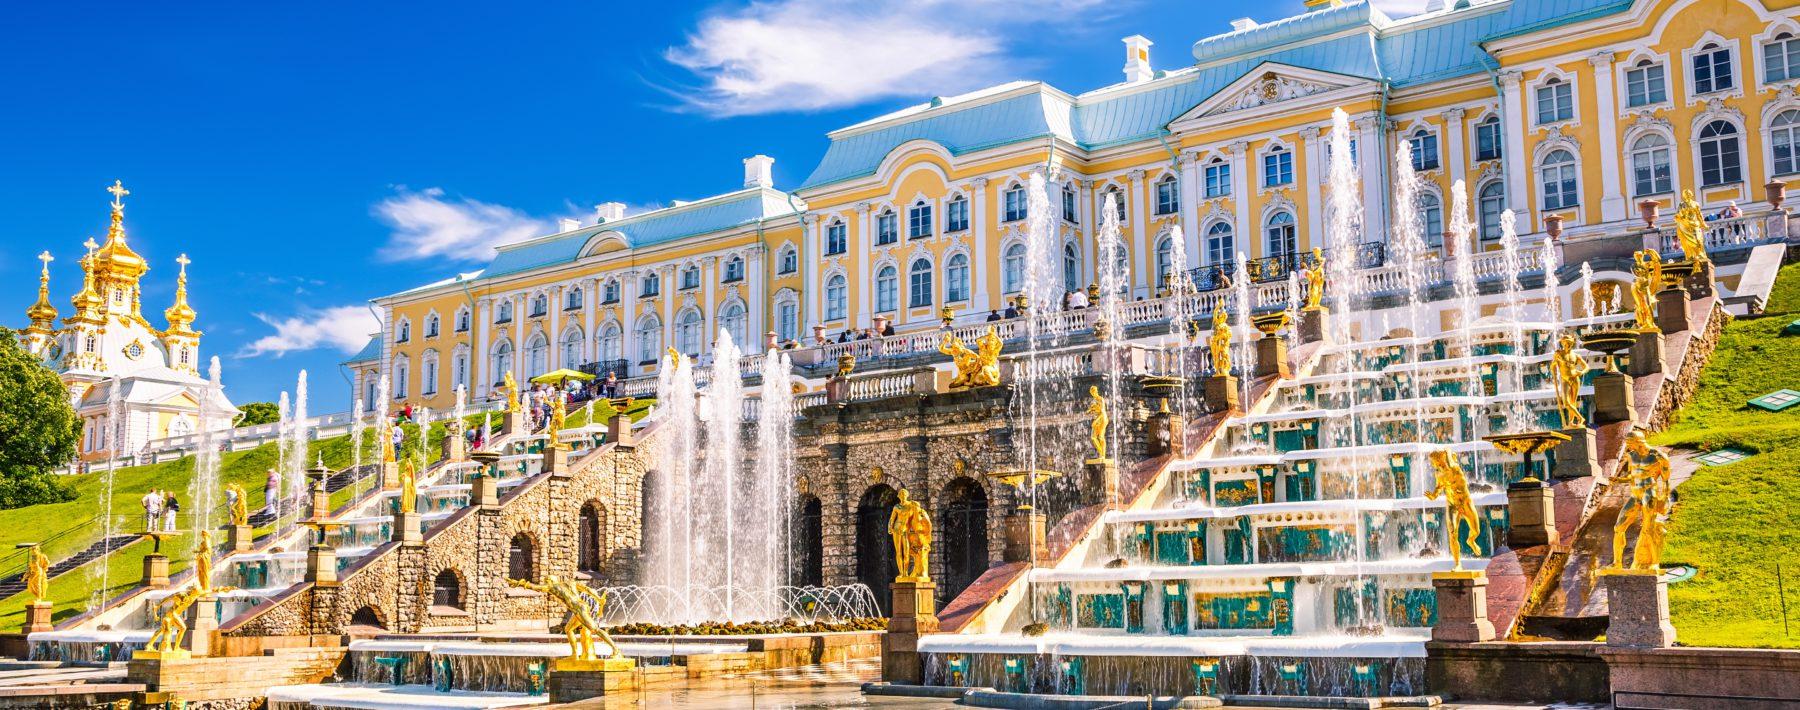 Grand Cascade in Peterhof, St Petersburg